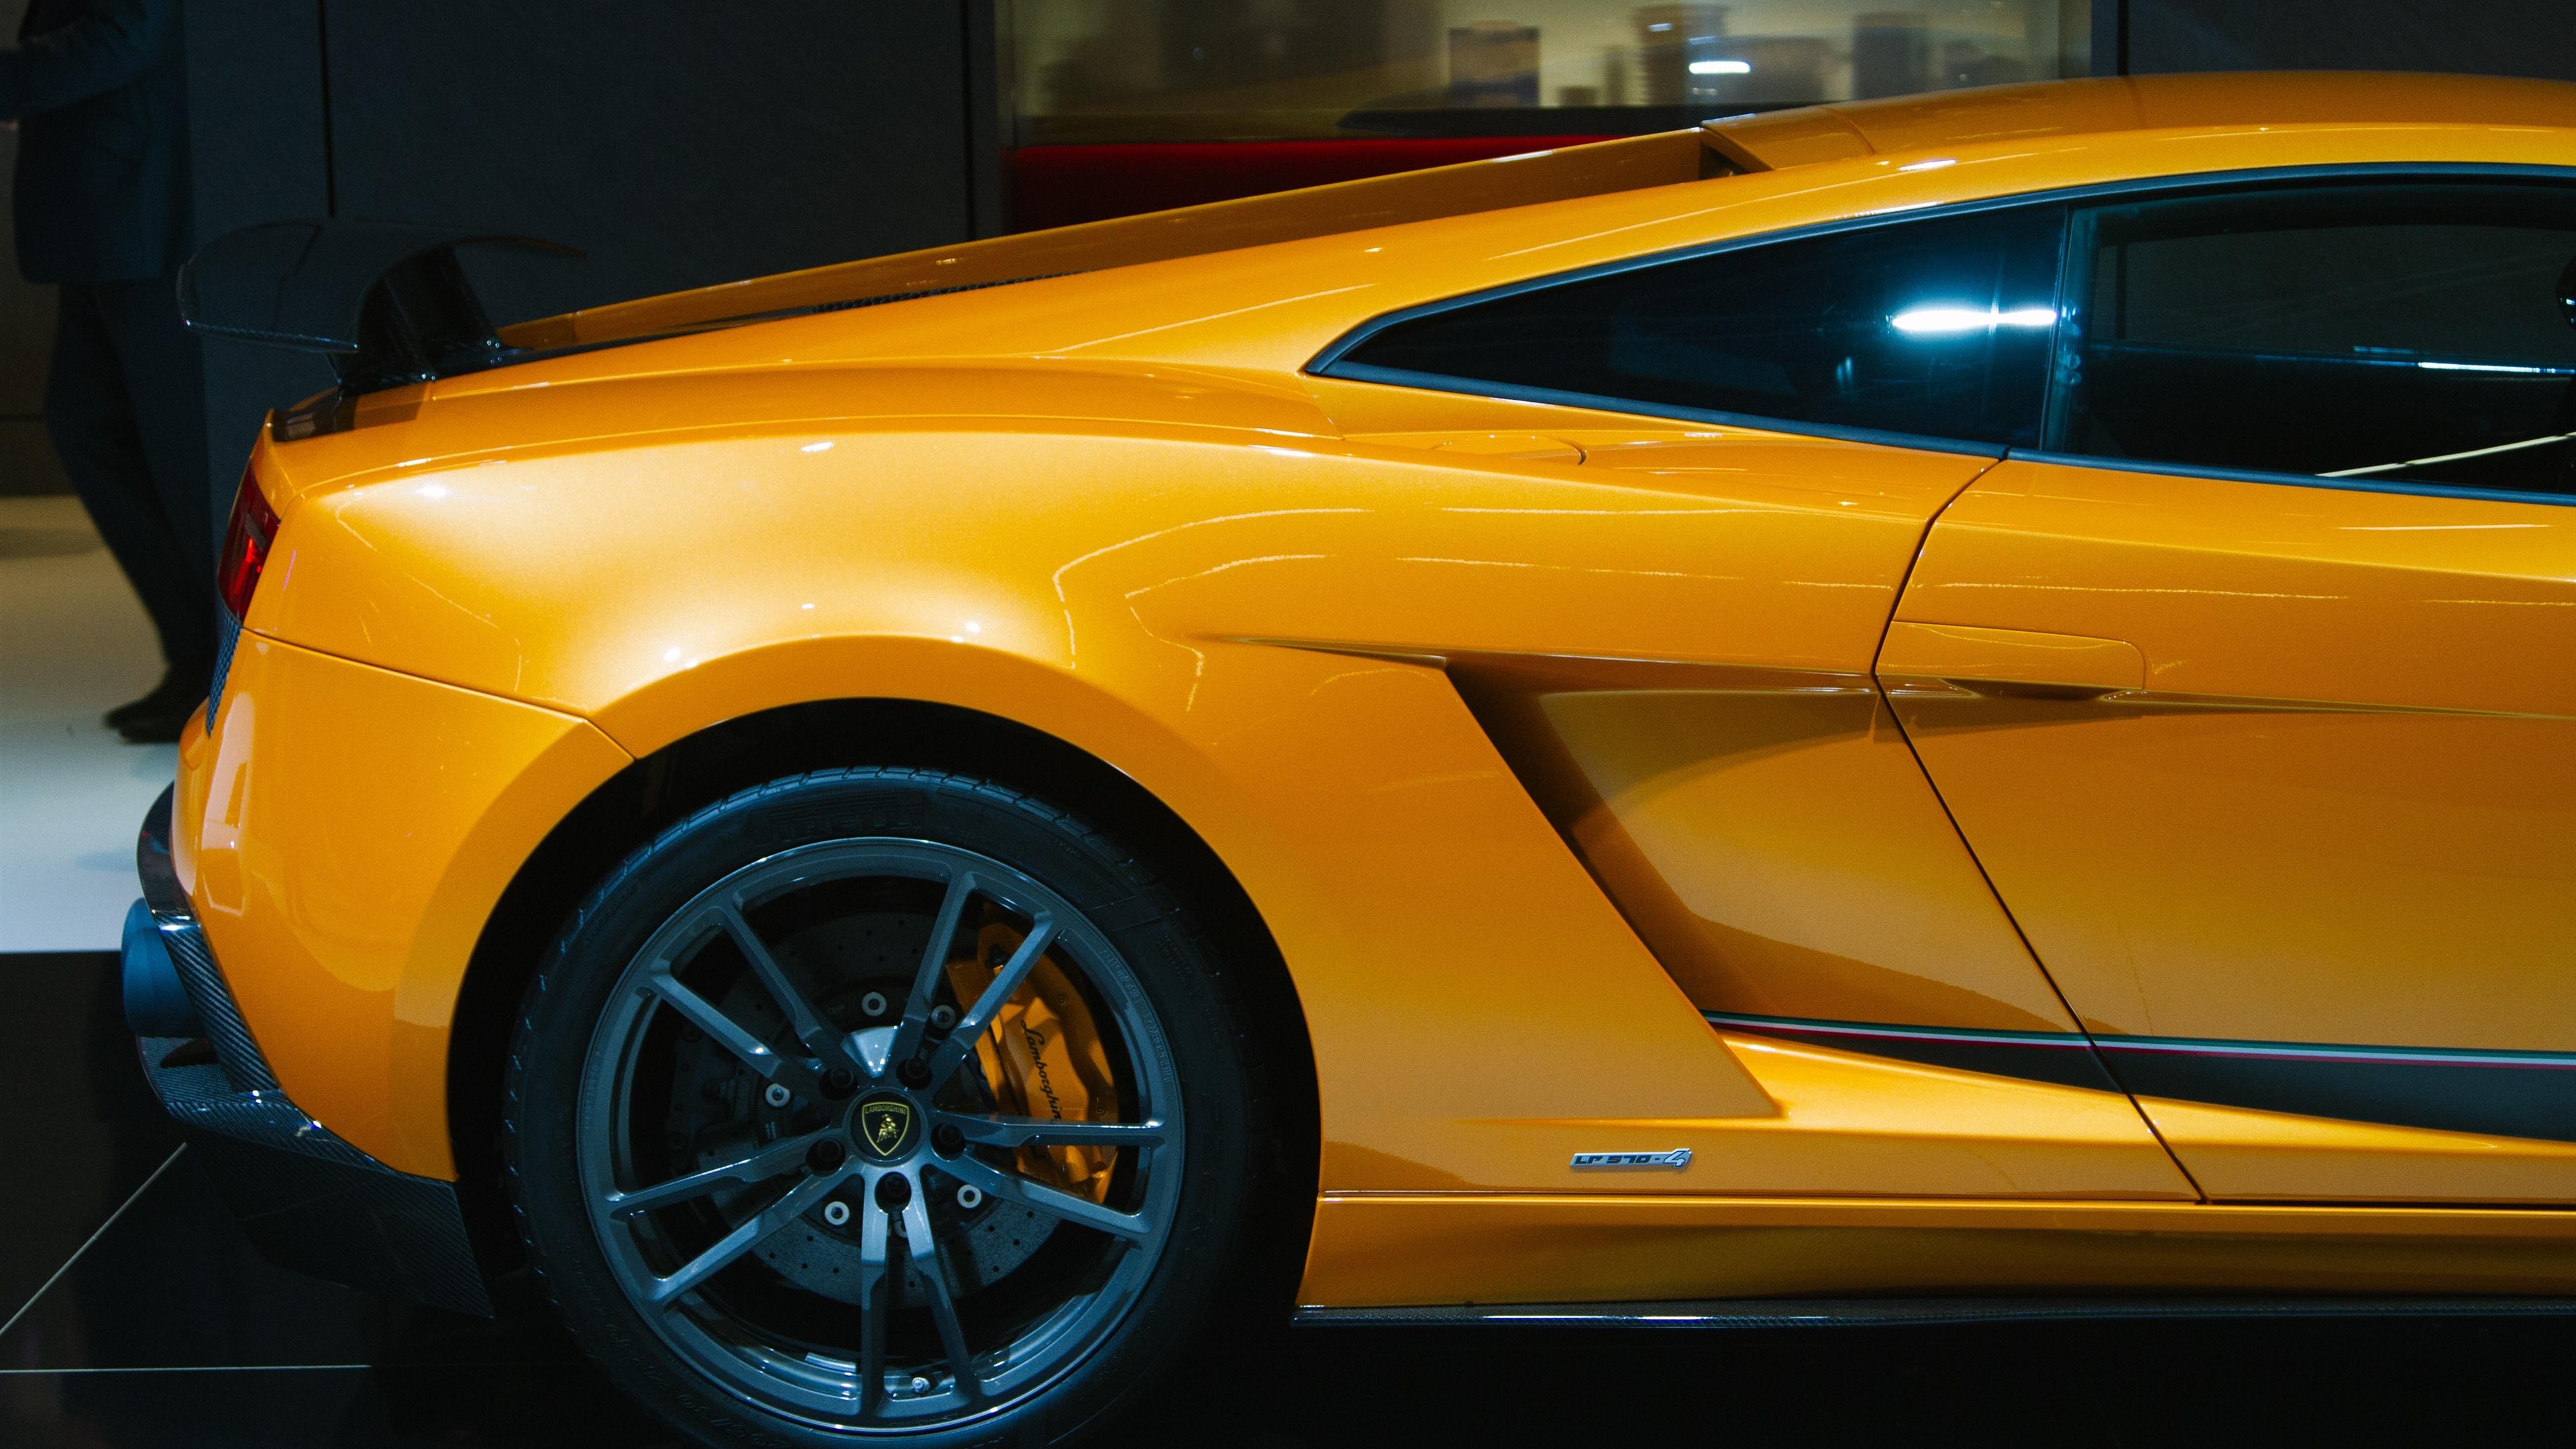 Lamborghini Yellow Car Rear View Wheel 1242x2688 Iphone Xs Max